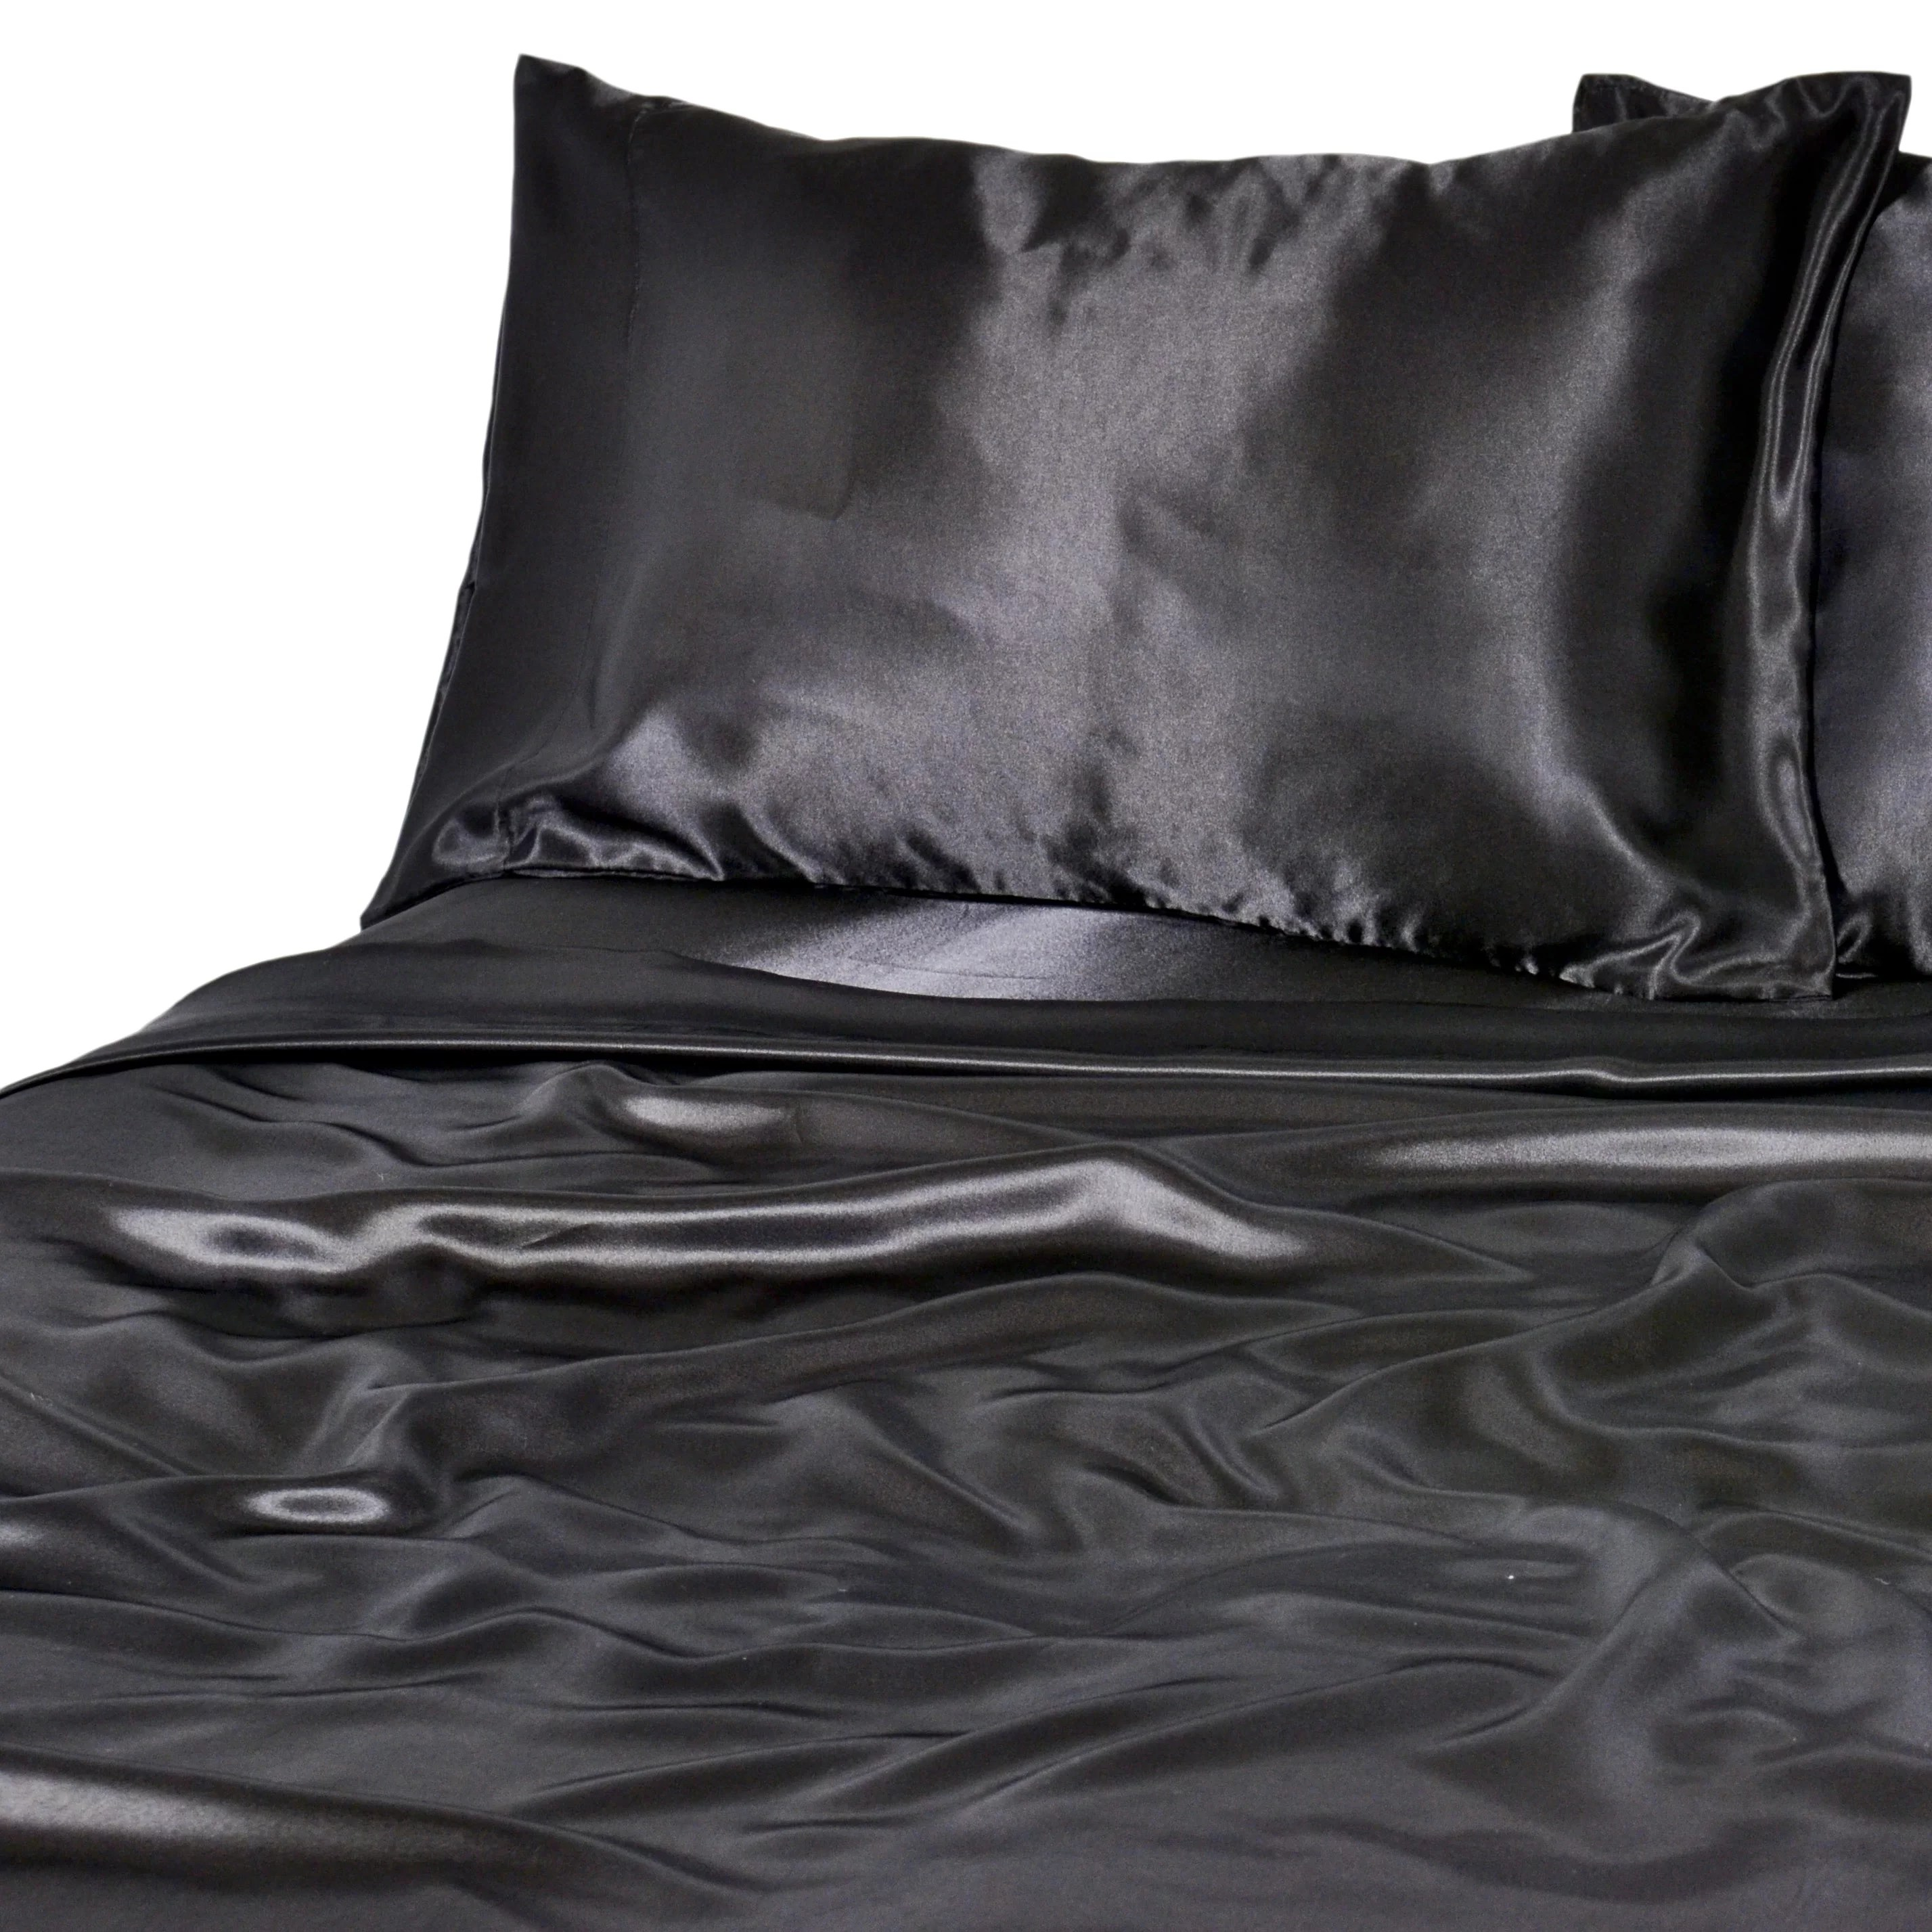 hawkes luxurious sheet set